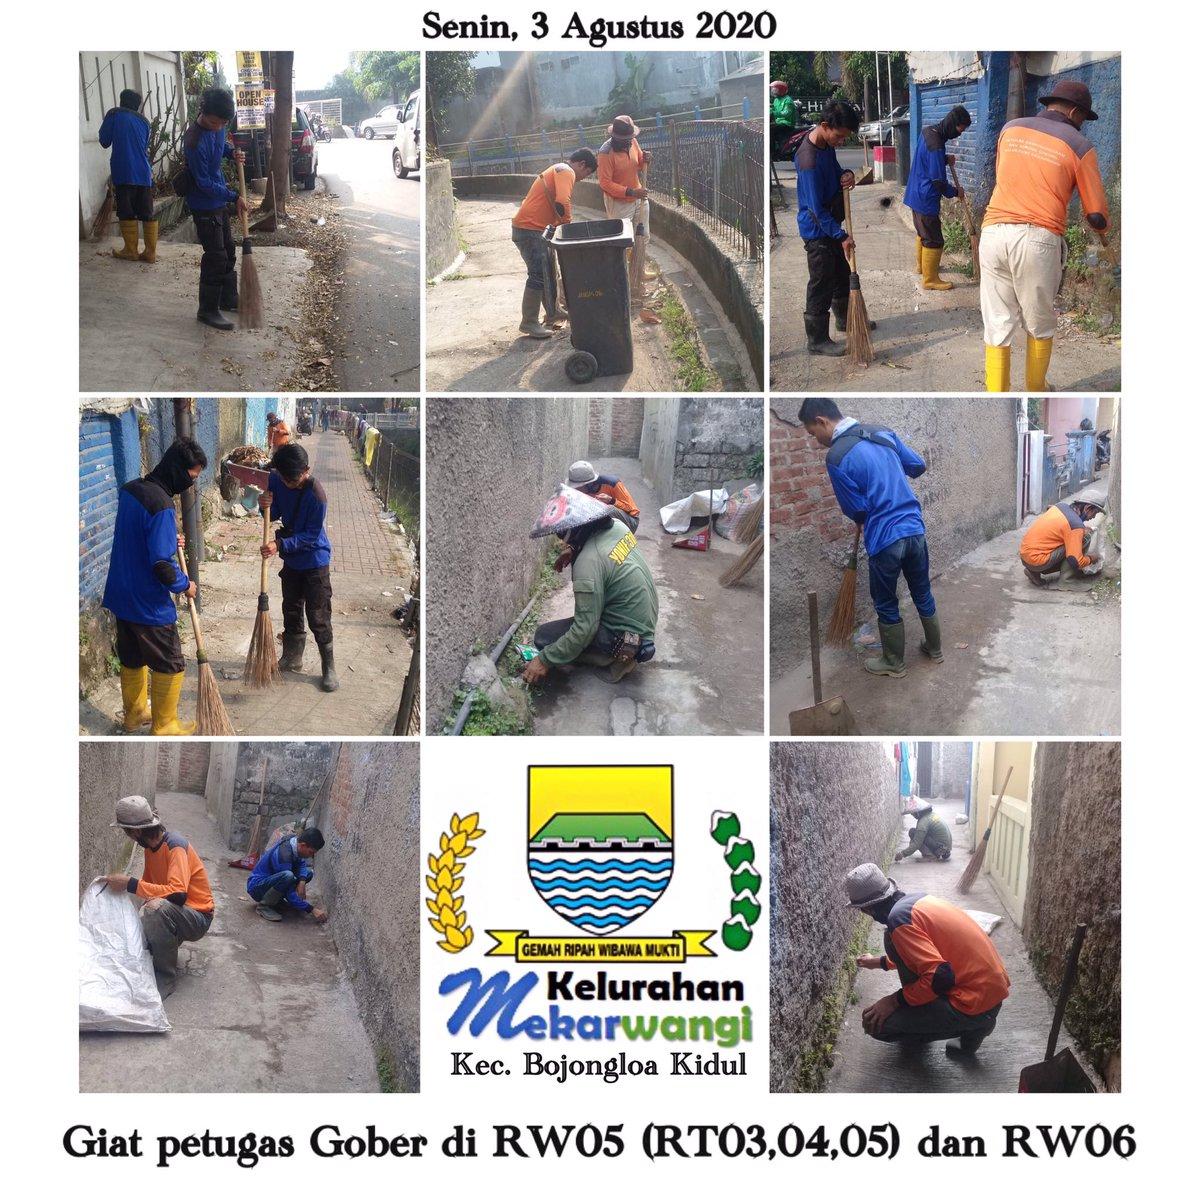 Giat petugas Gober pagi pembersihan jalan lingkungan di RW05 (RT03,04,05)  dan RW06 Kelurahan Mekarwangi Kecamatan Bojongloa Kidul Kota Bandung pada hari Senin tanggal 3 Agustus 2020 @OdedMD @kangyanamulyana @dlhk_kotabdg @pembdg @kecbojkid_ktbdg #bandungjuara #tetapsemangat pic.twitter.com/wy2hHJ0Ywg